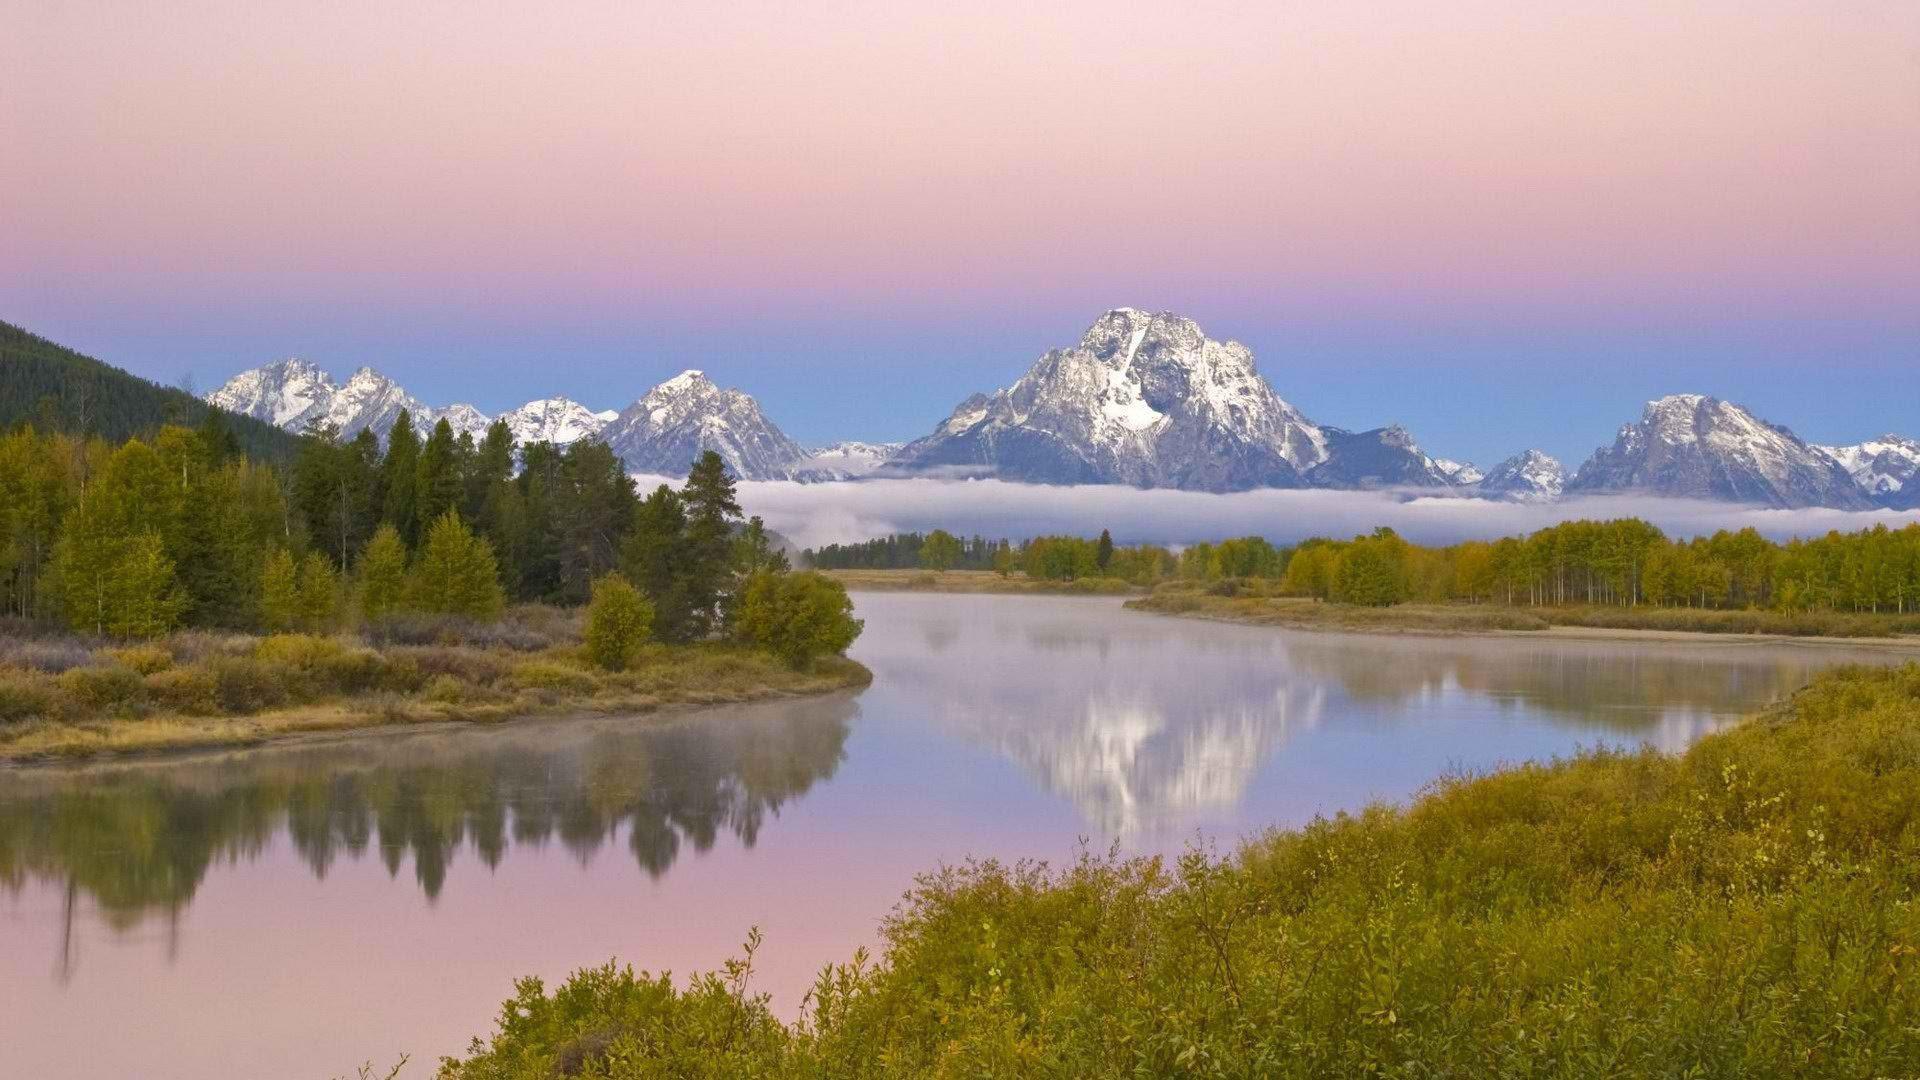 Hd Wyoming Grand Teton National Park Rivers Mount Download